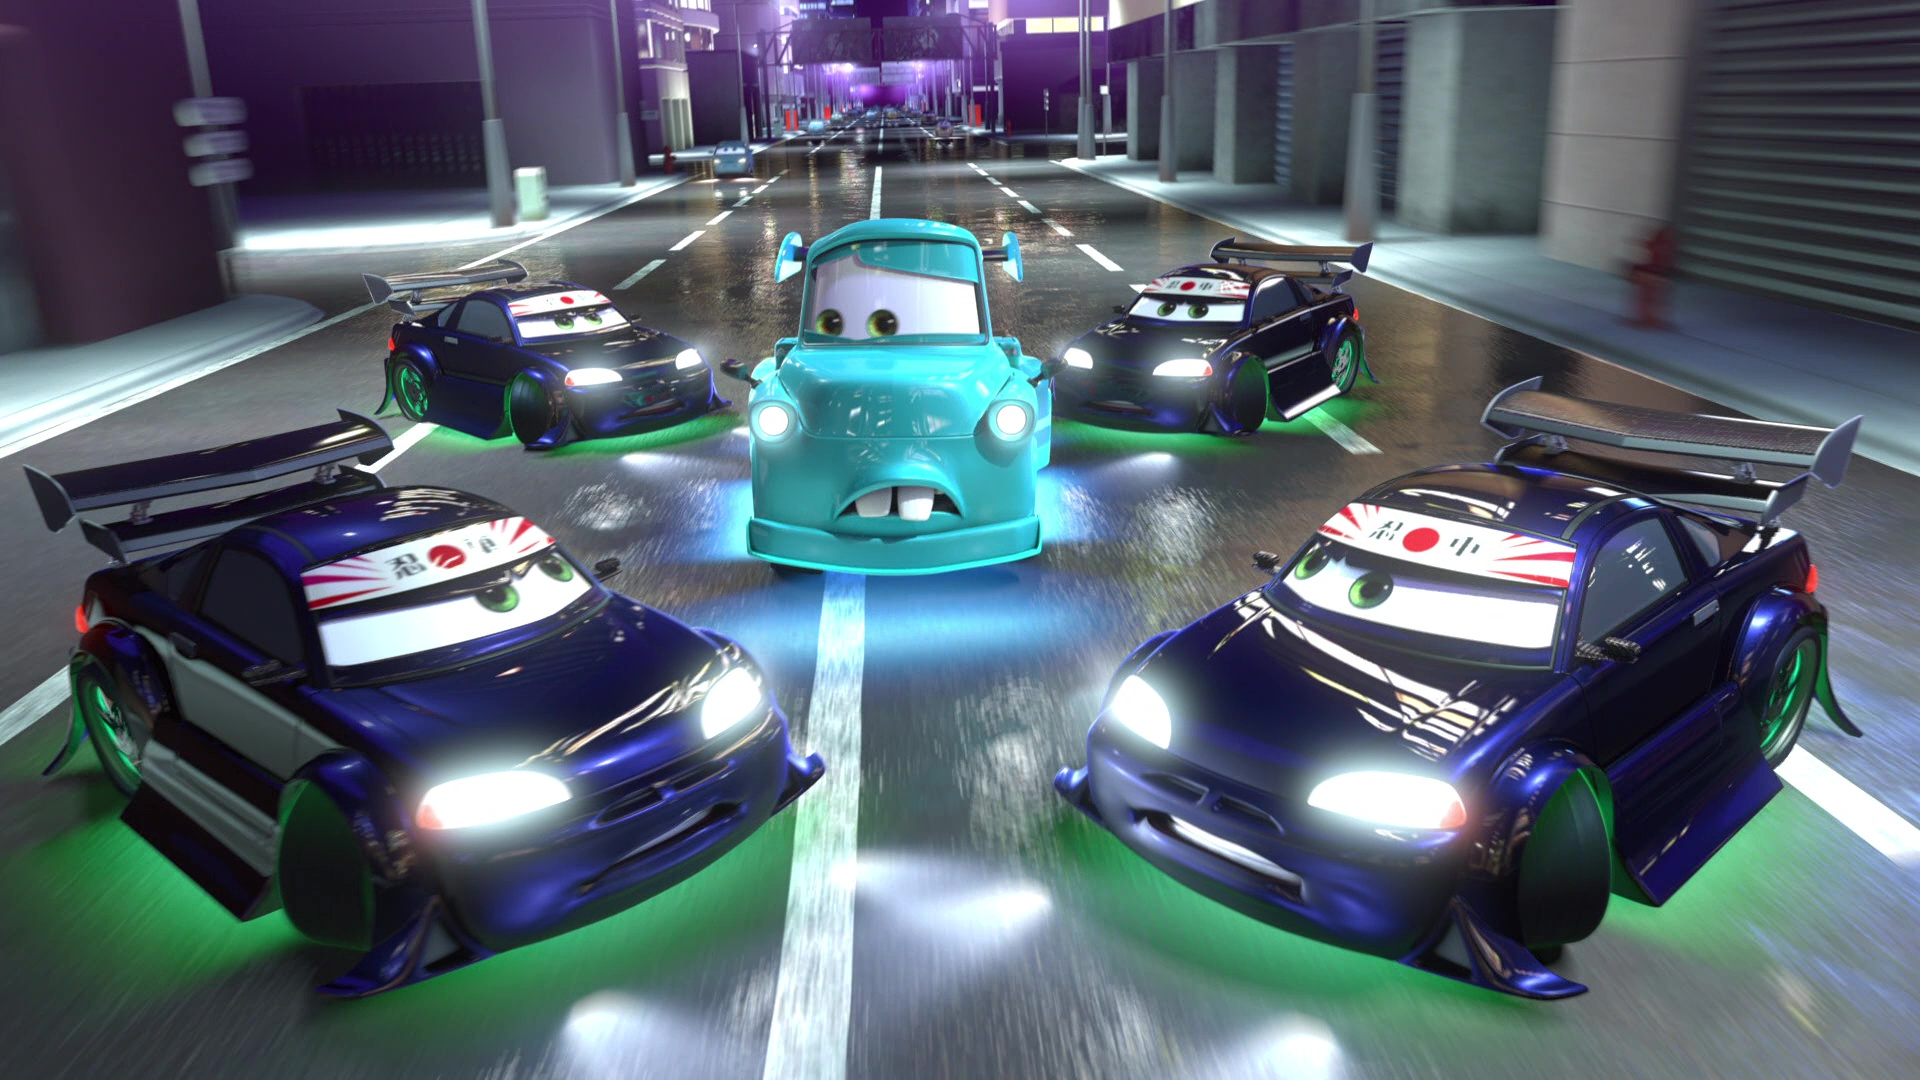 ninja-kabuto-cars-toon-tokyo-martin-01